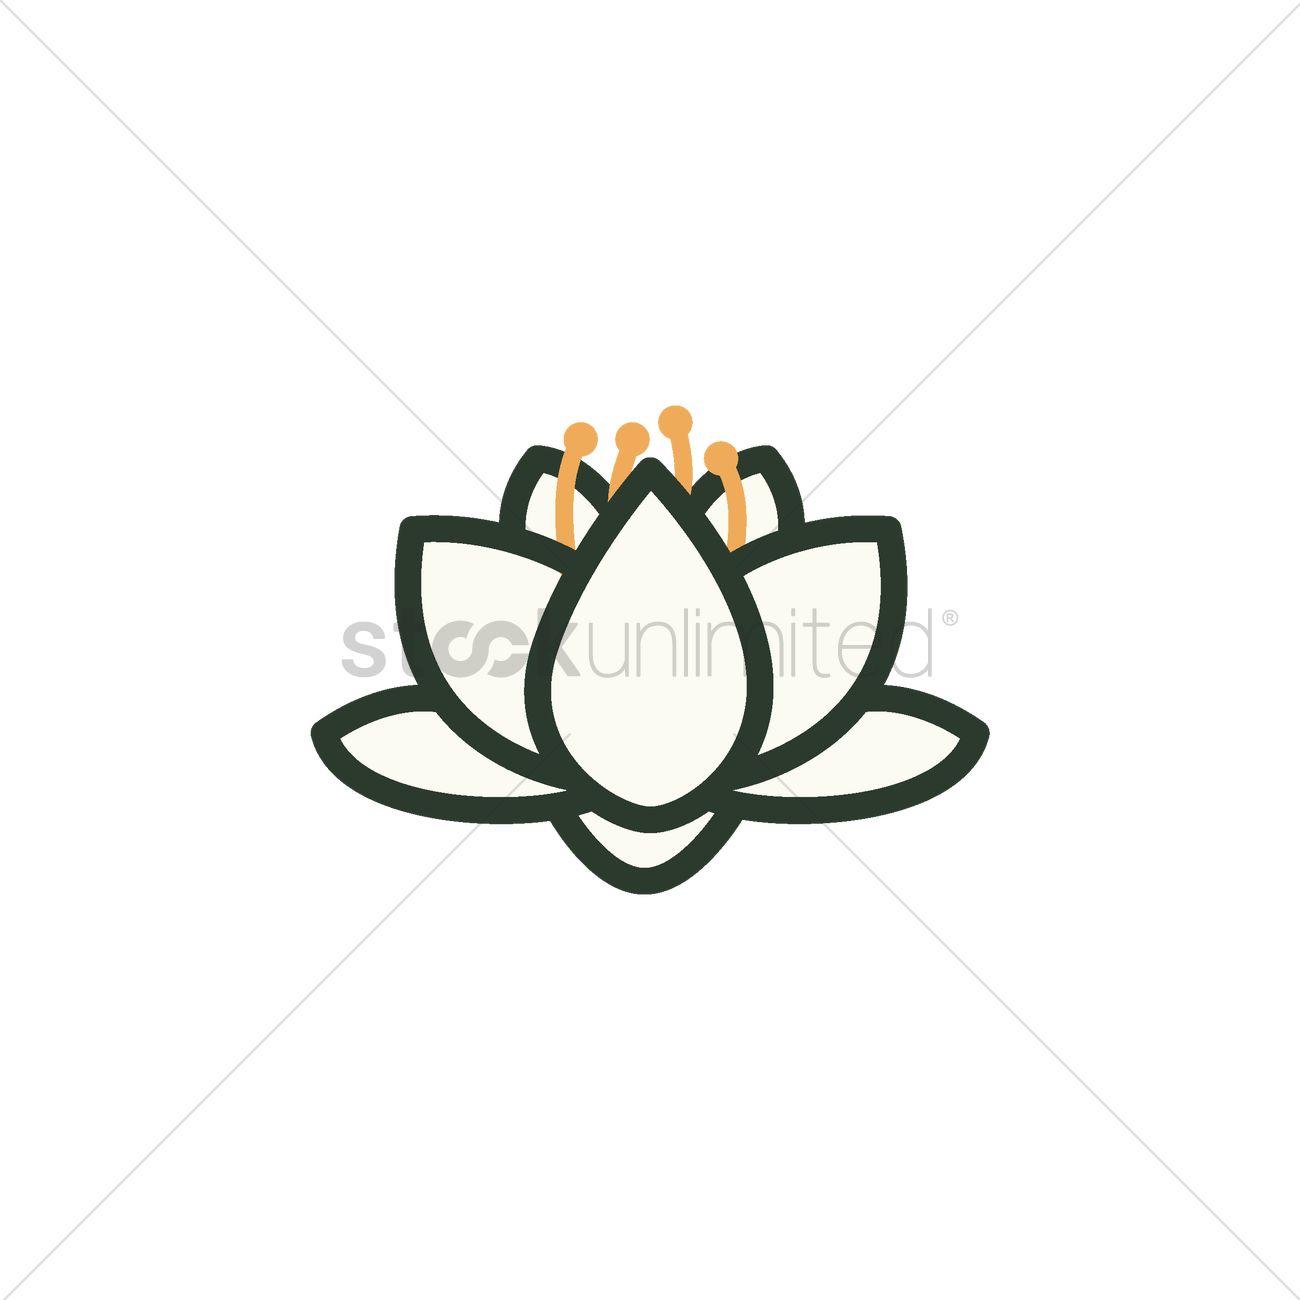 Lotus flower vector image 1967671 stockunlimited lotus flower vector graphic izmirmasajfo